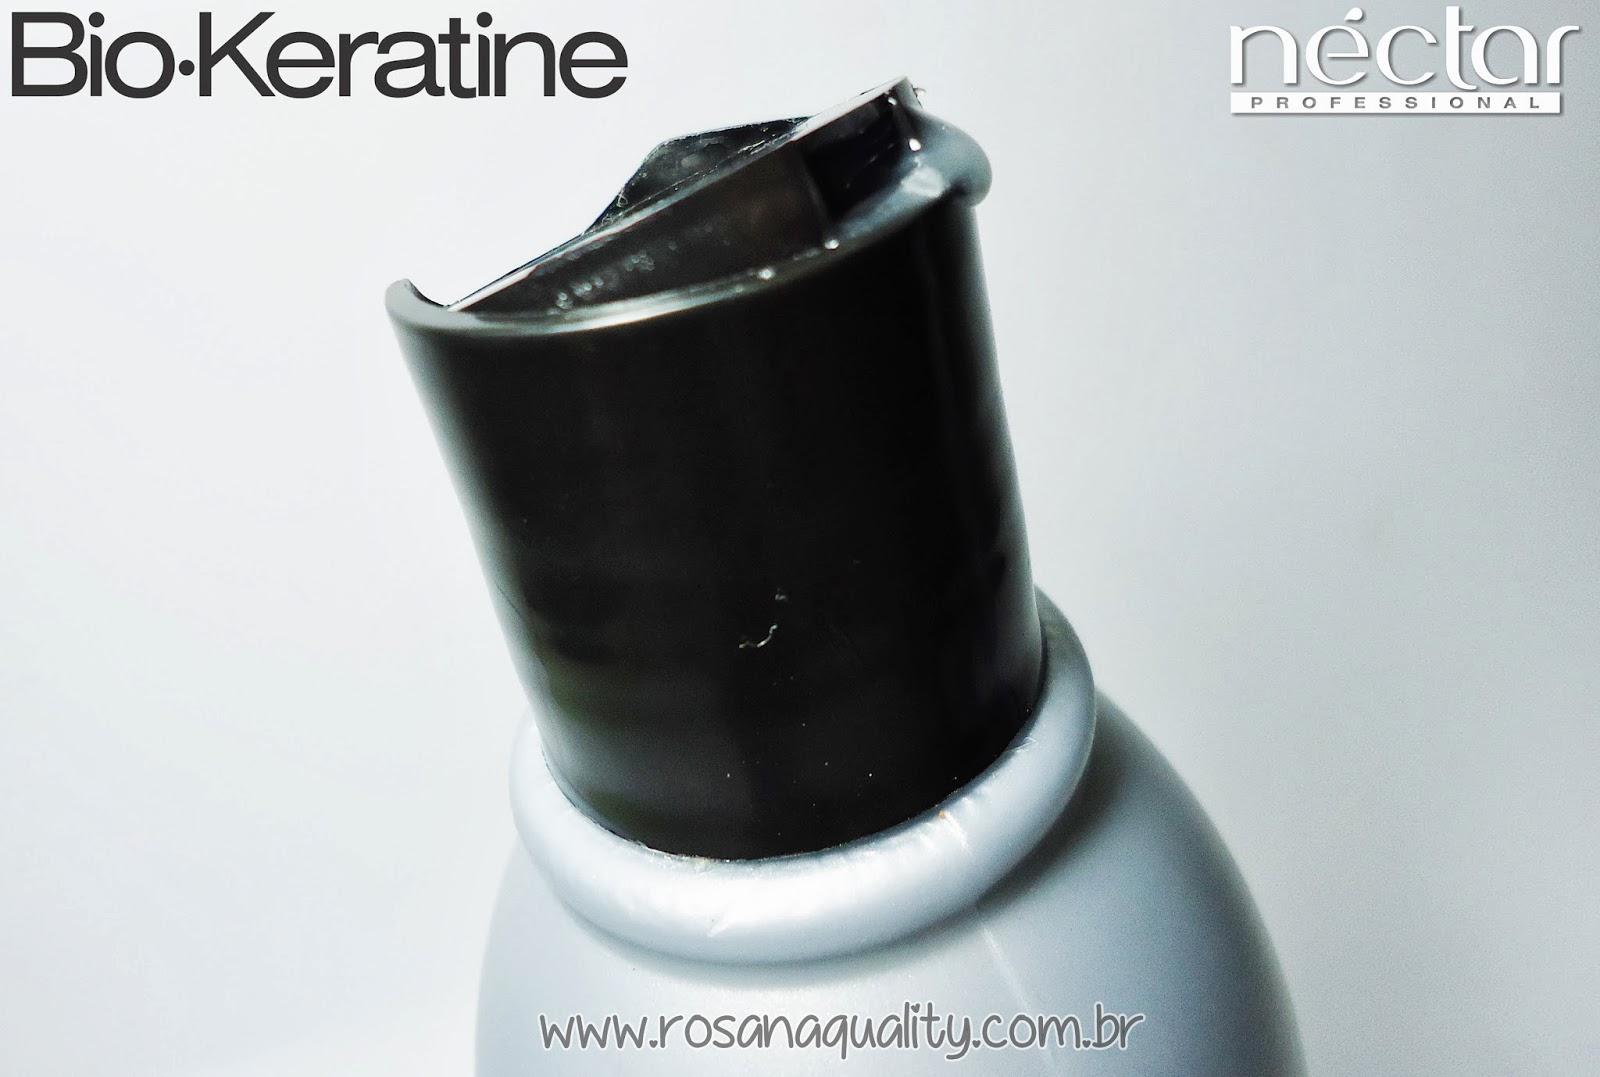 Bio Keratine Néctar